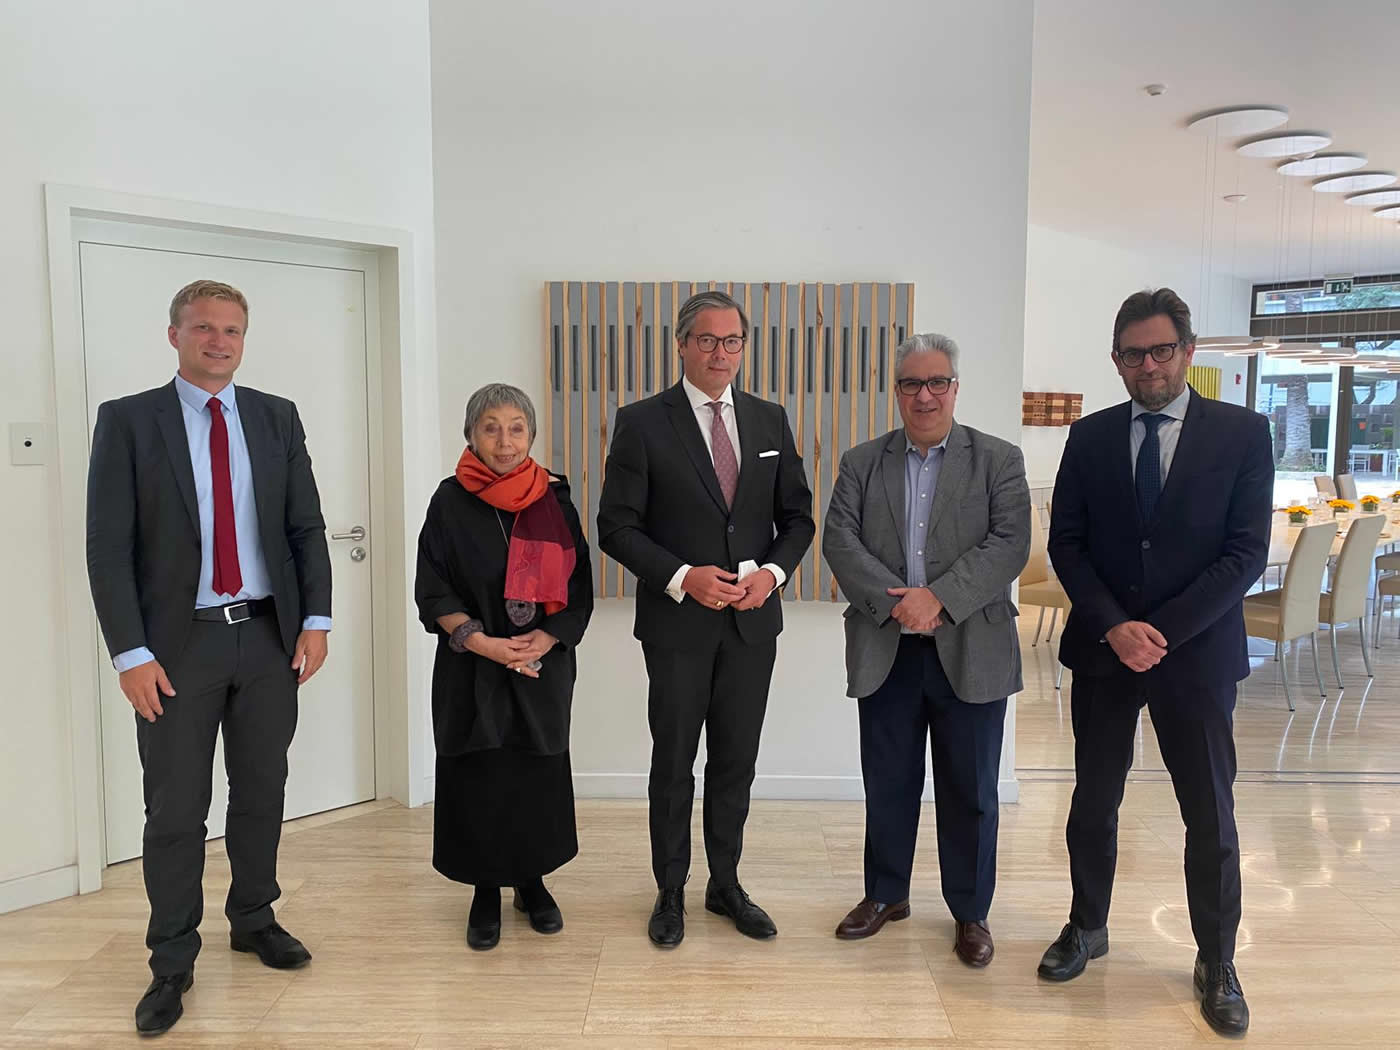 Philipp Herzog, Norma Morandini, S.E. Ulrich Sante, Gabriel Salvia y Brian Schapira.